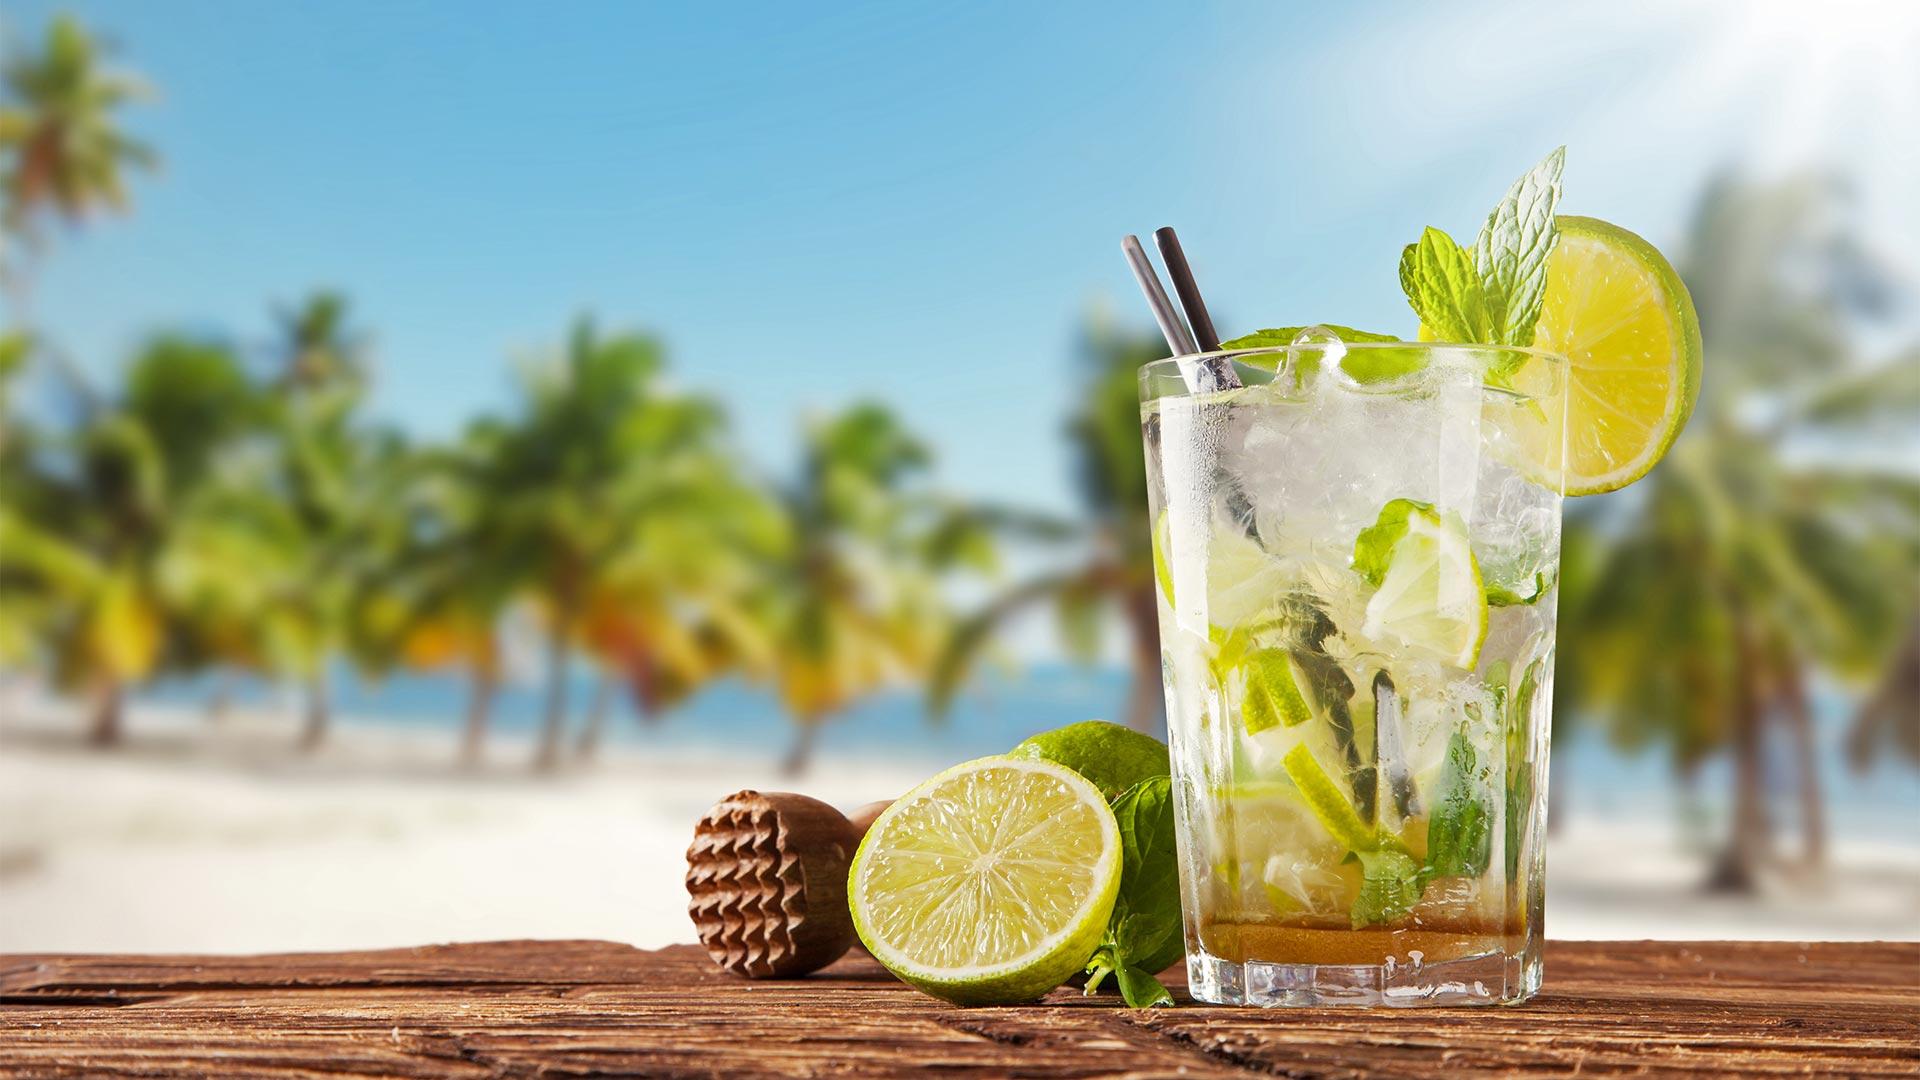 Paste 2021 - Sejur plaja Punta Cana, Republica Dominicana, 11 zile - Zbor Lufthansa